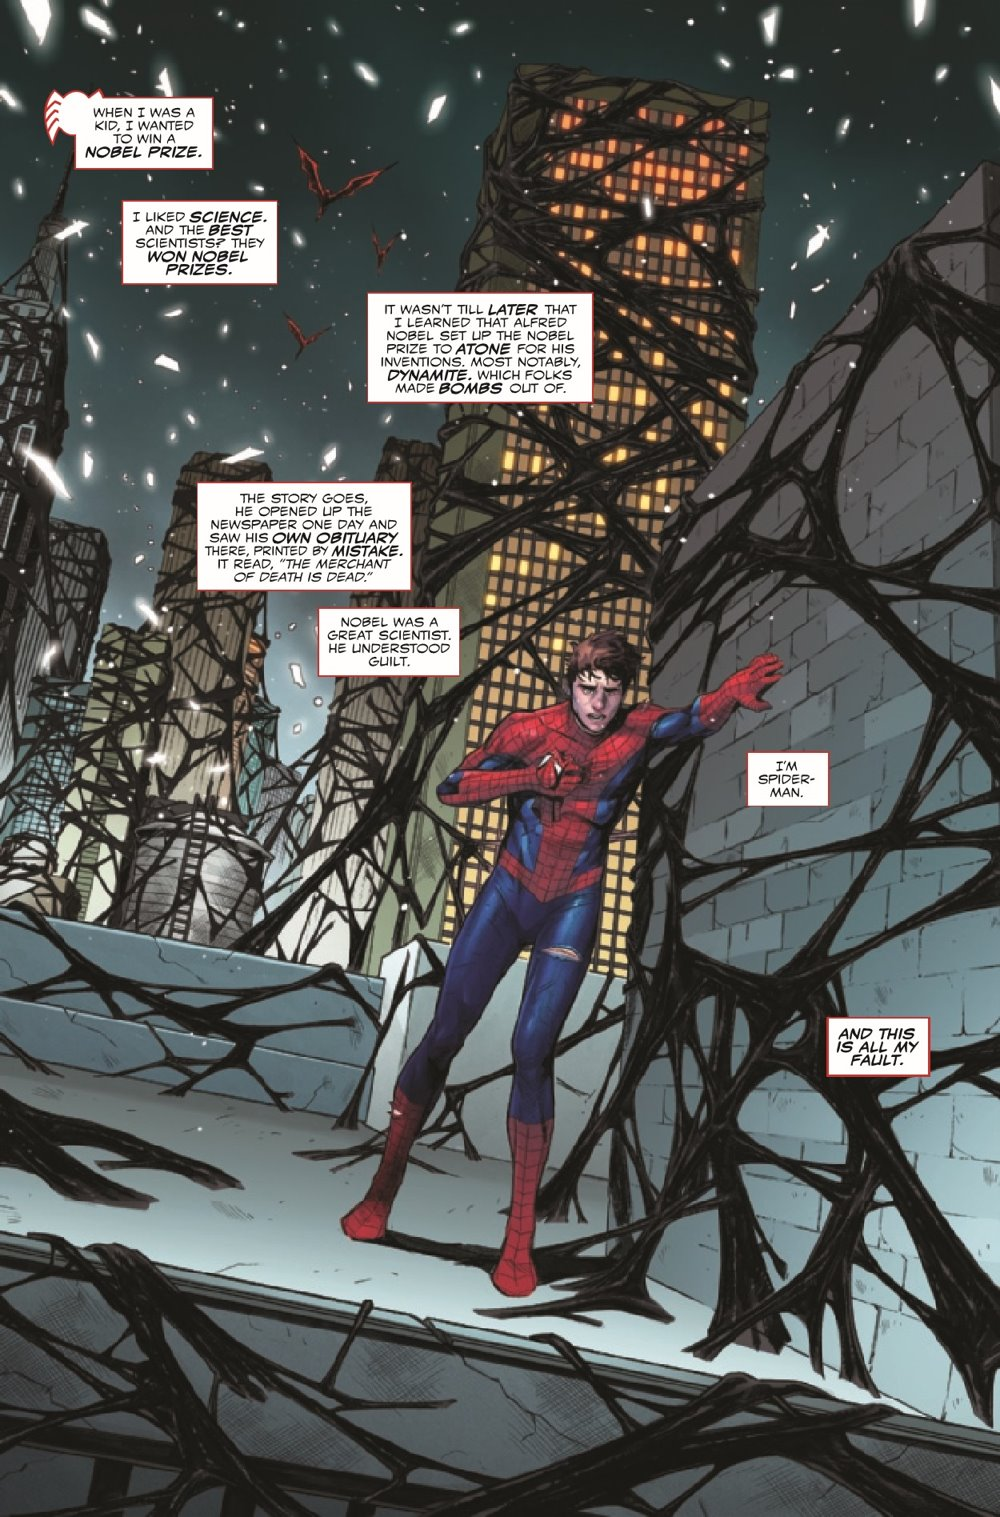 SMKIB2021001_Preview-3 ComicList Previews: KING IN BLACK SPIDER-MAN #1